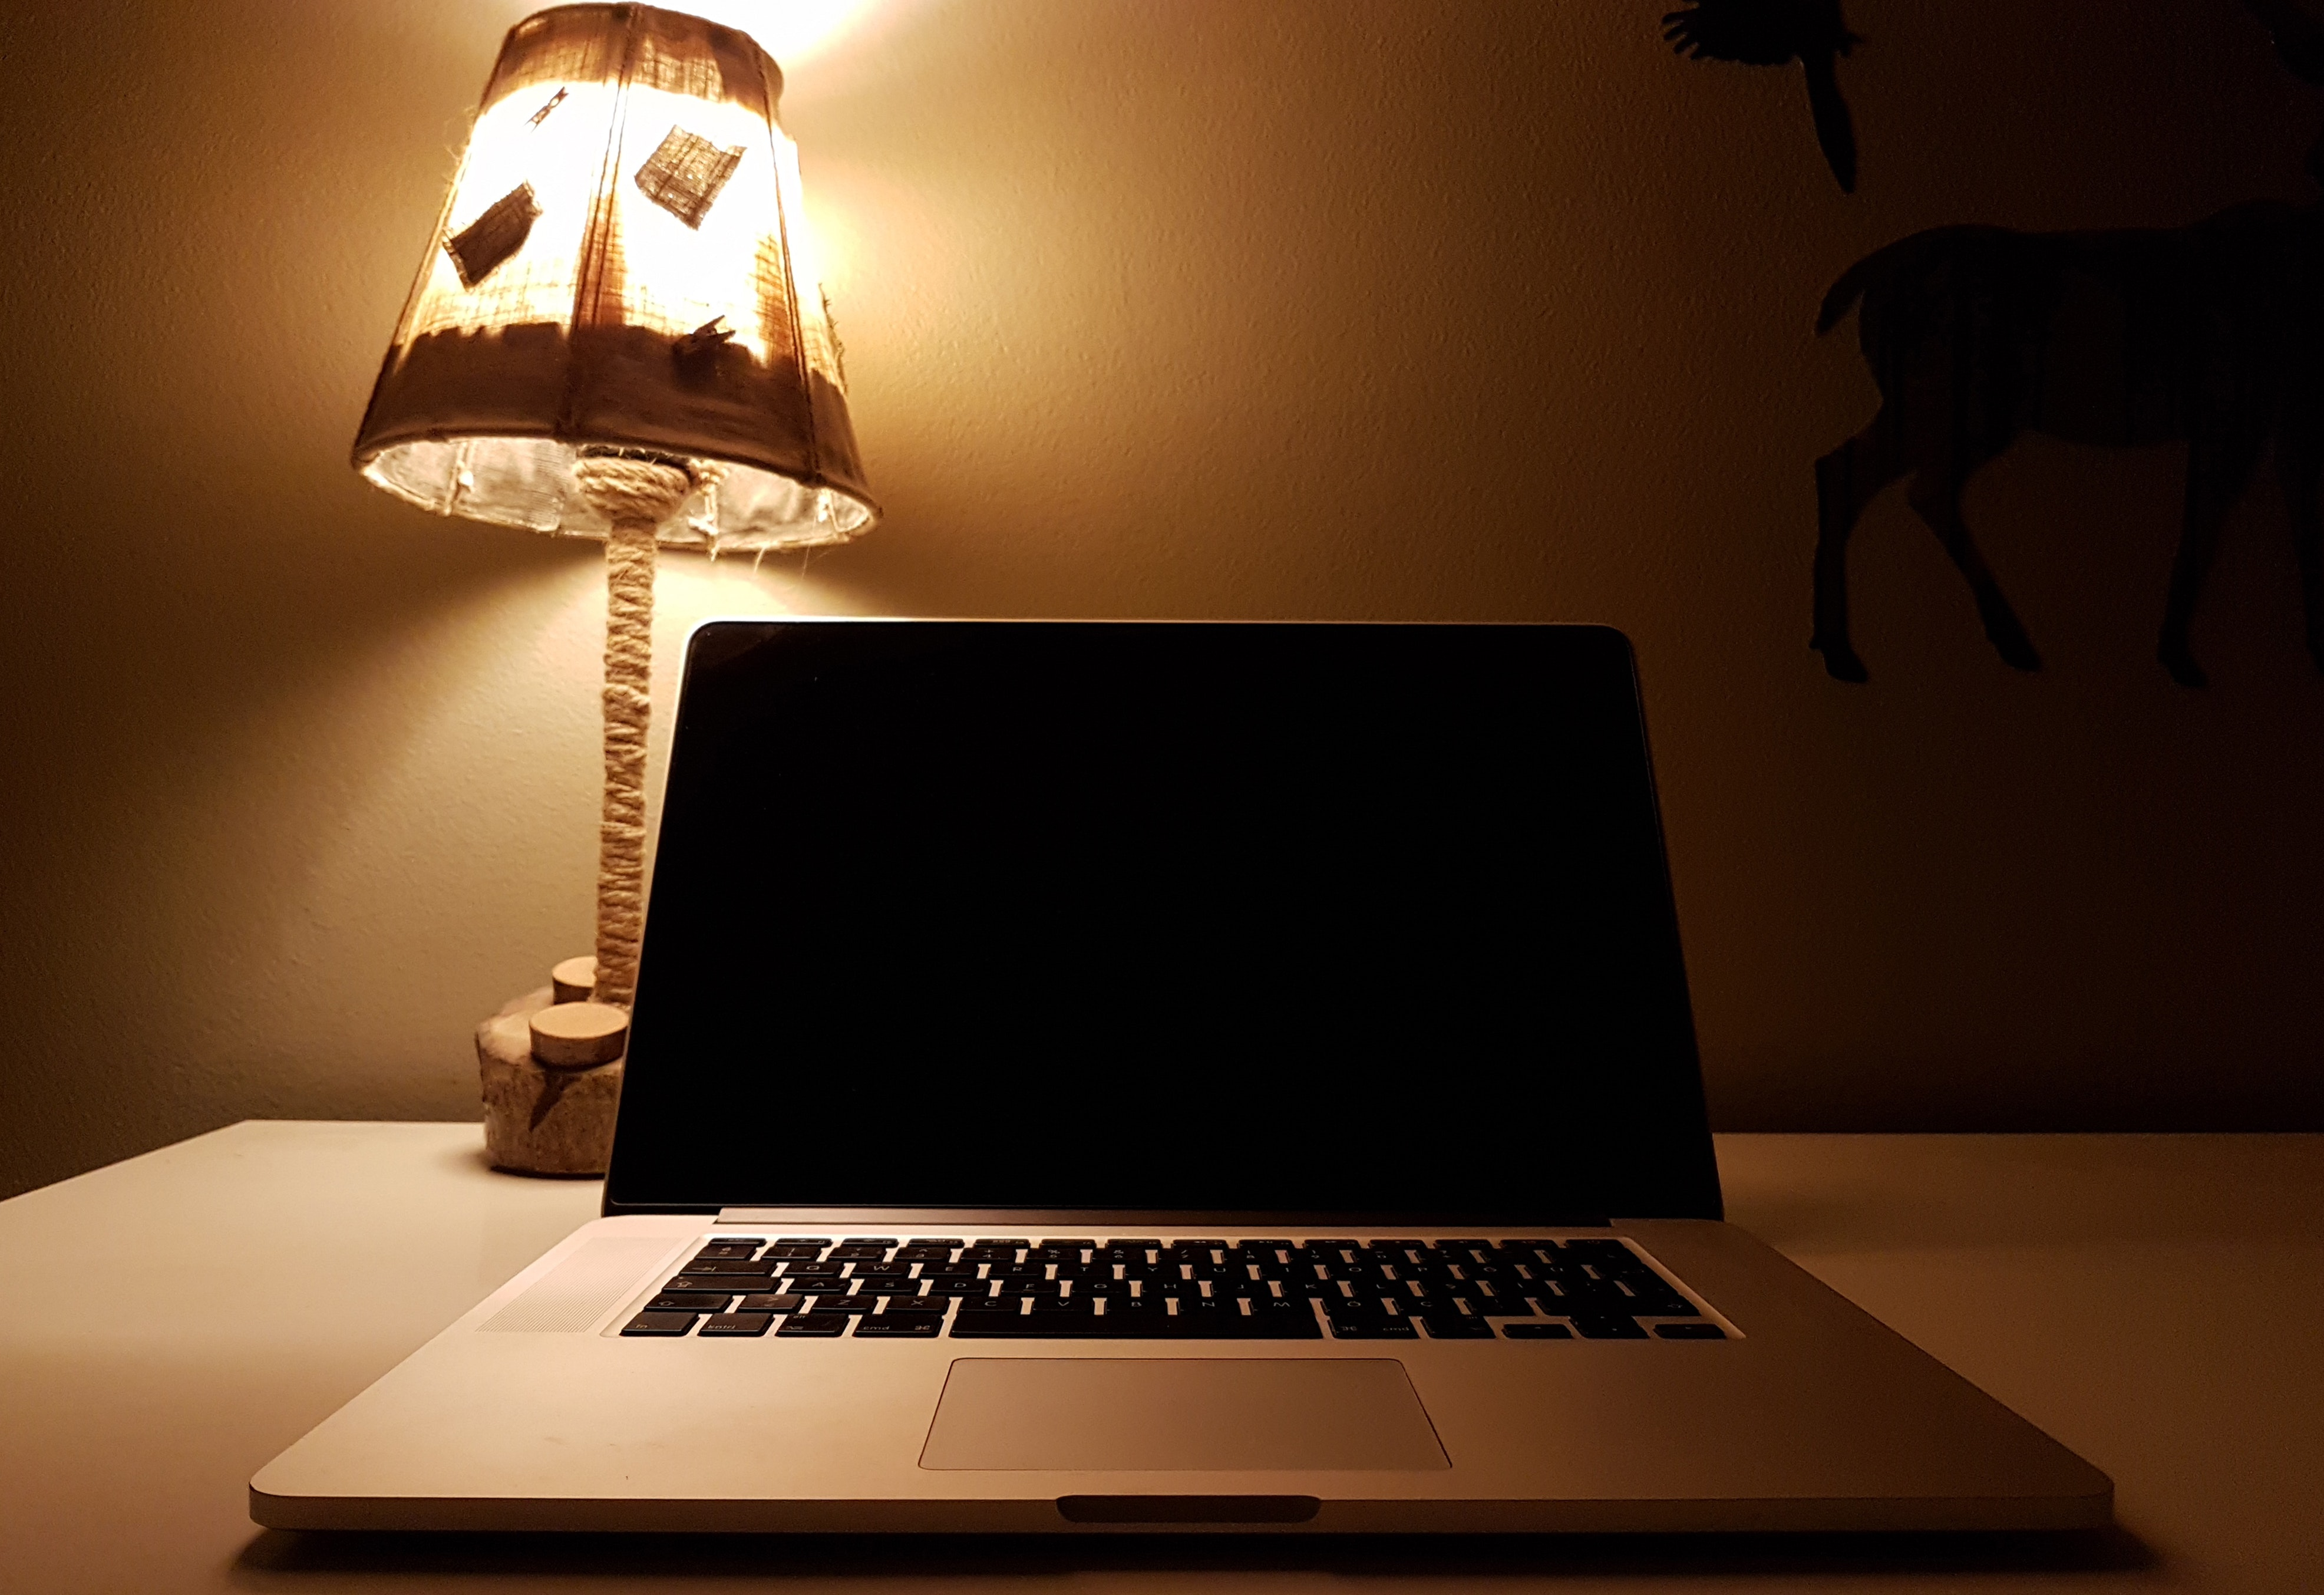 Macbook Pro, Computer, Desk, Keyboard, Lamp, HQ Photo